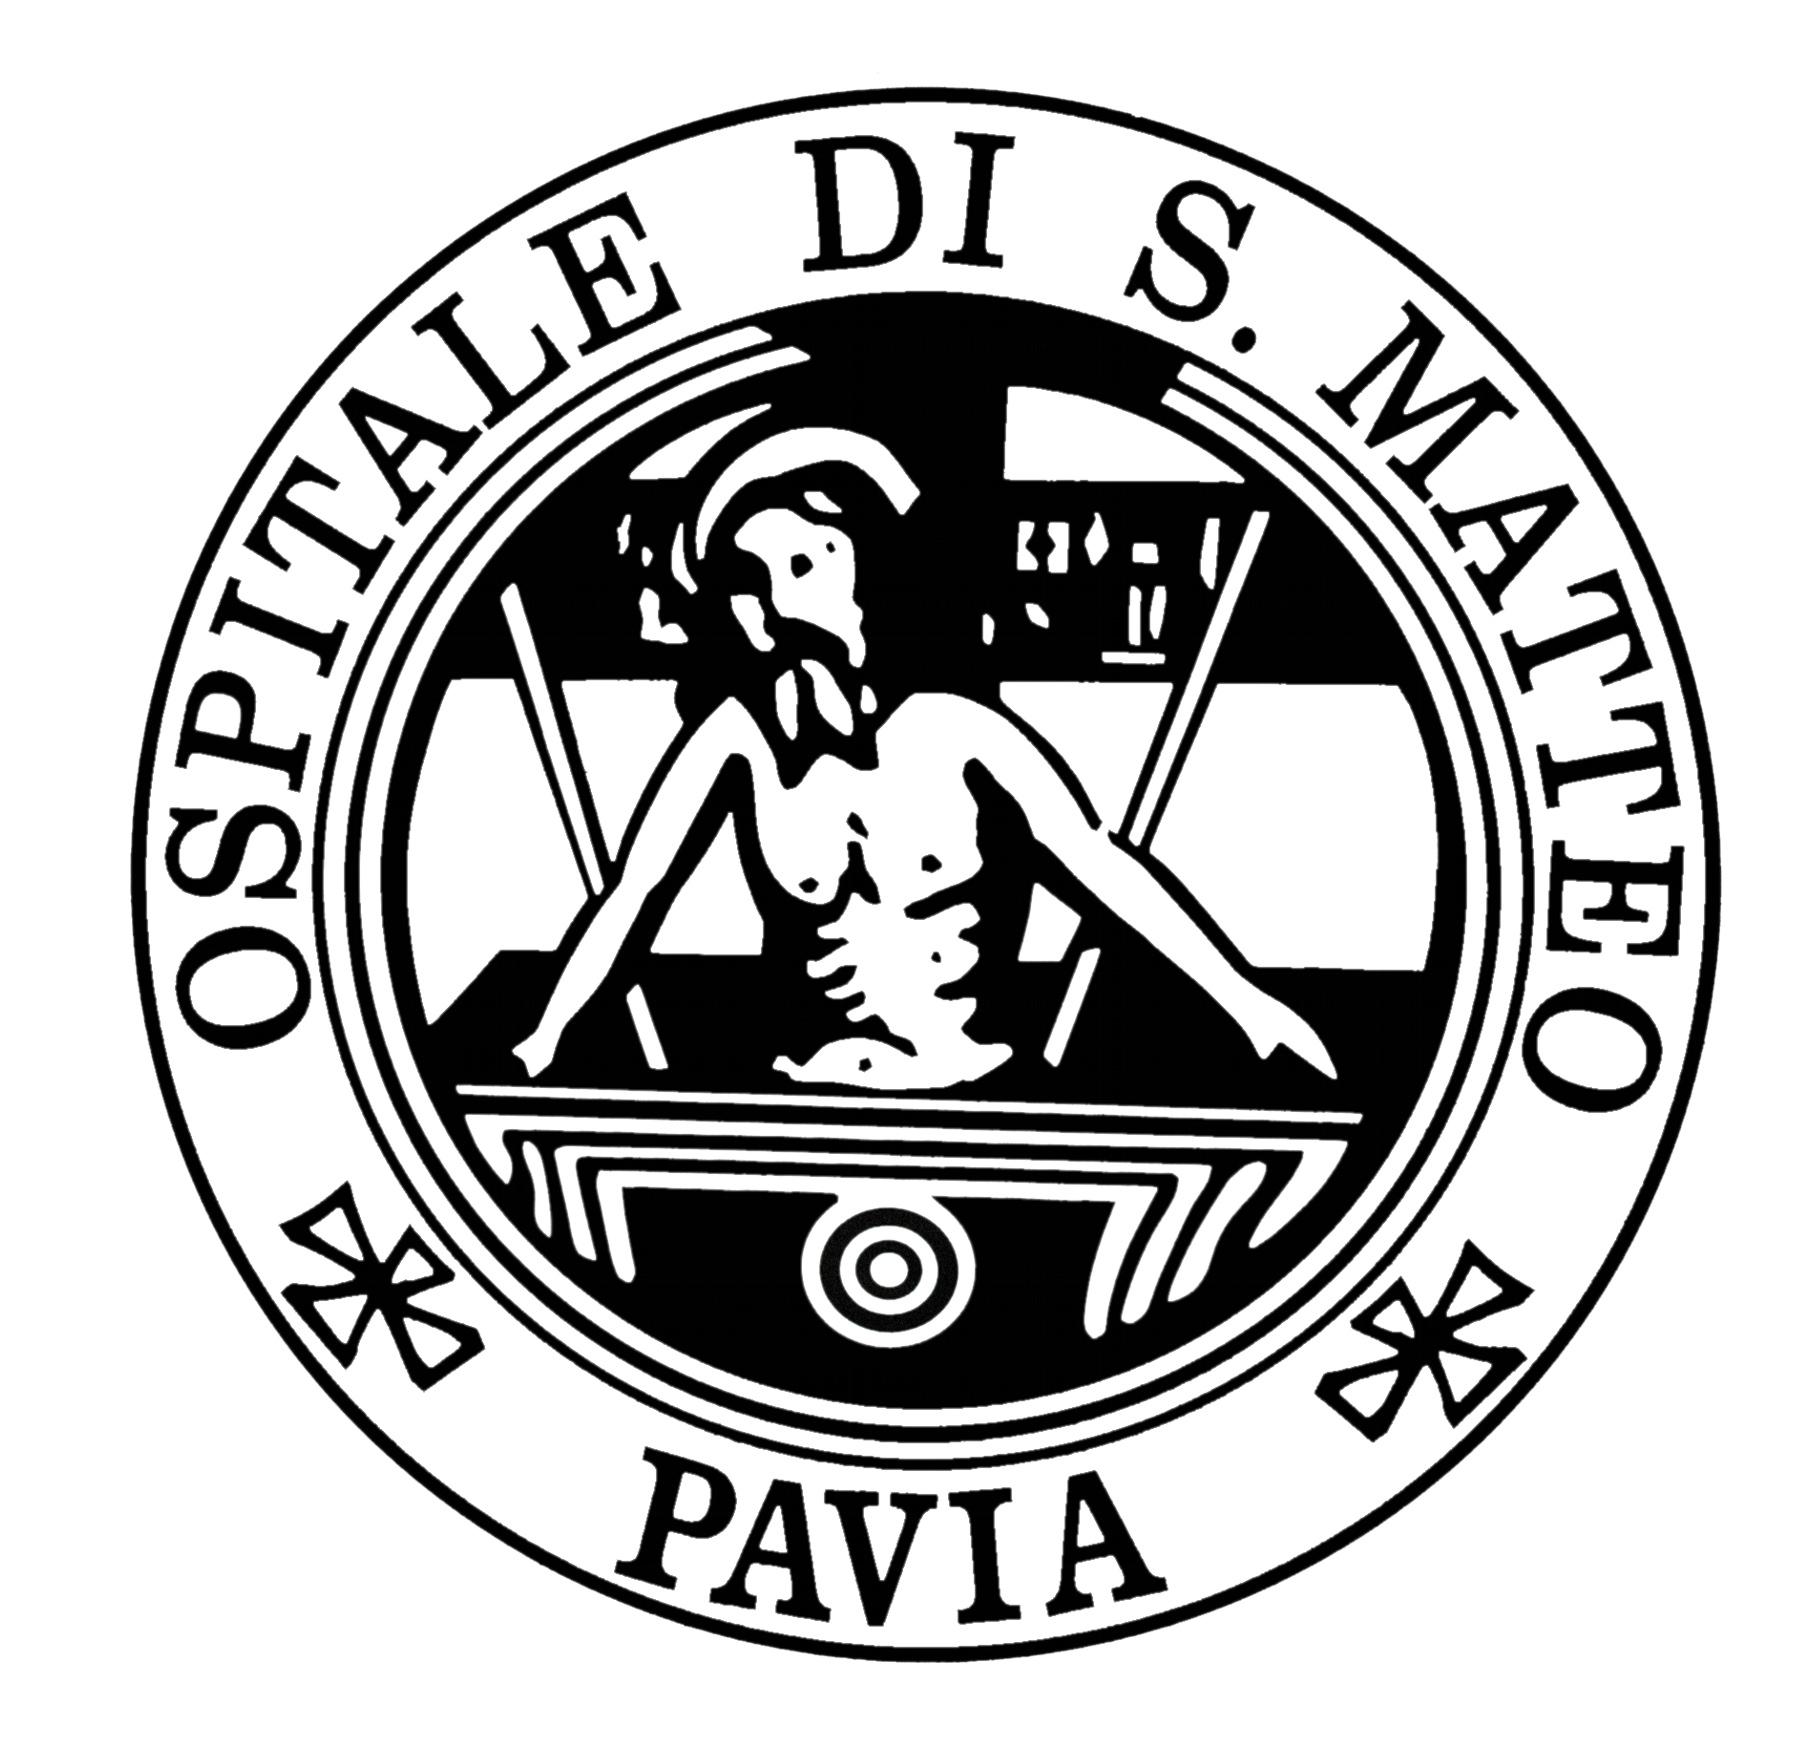 PAVIA SAN MATTEO endocrinologia